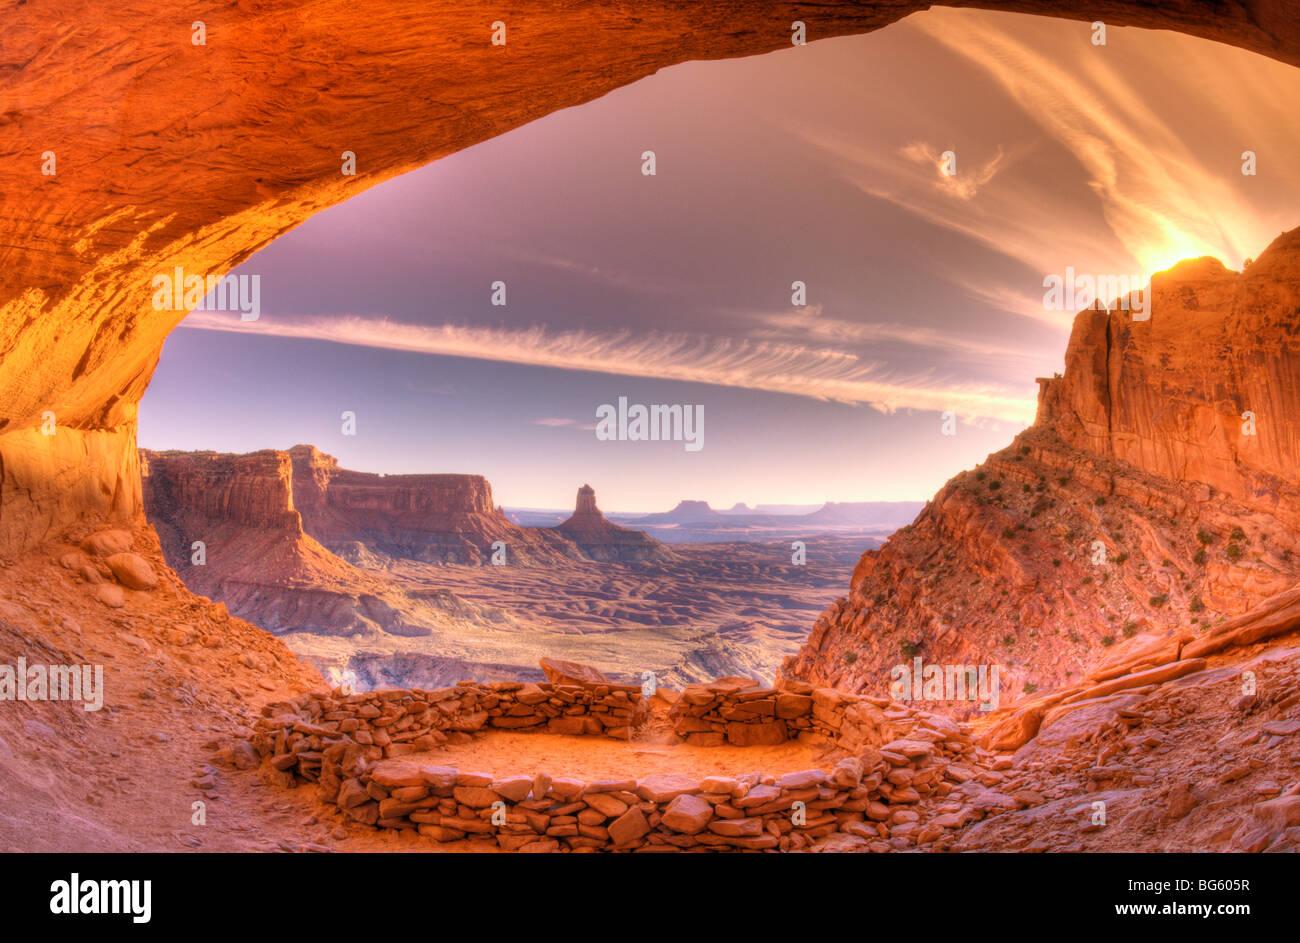 Evening light on False Kiva, Island in the Sky, Canyonlands National Park, Utah - Stock Image